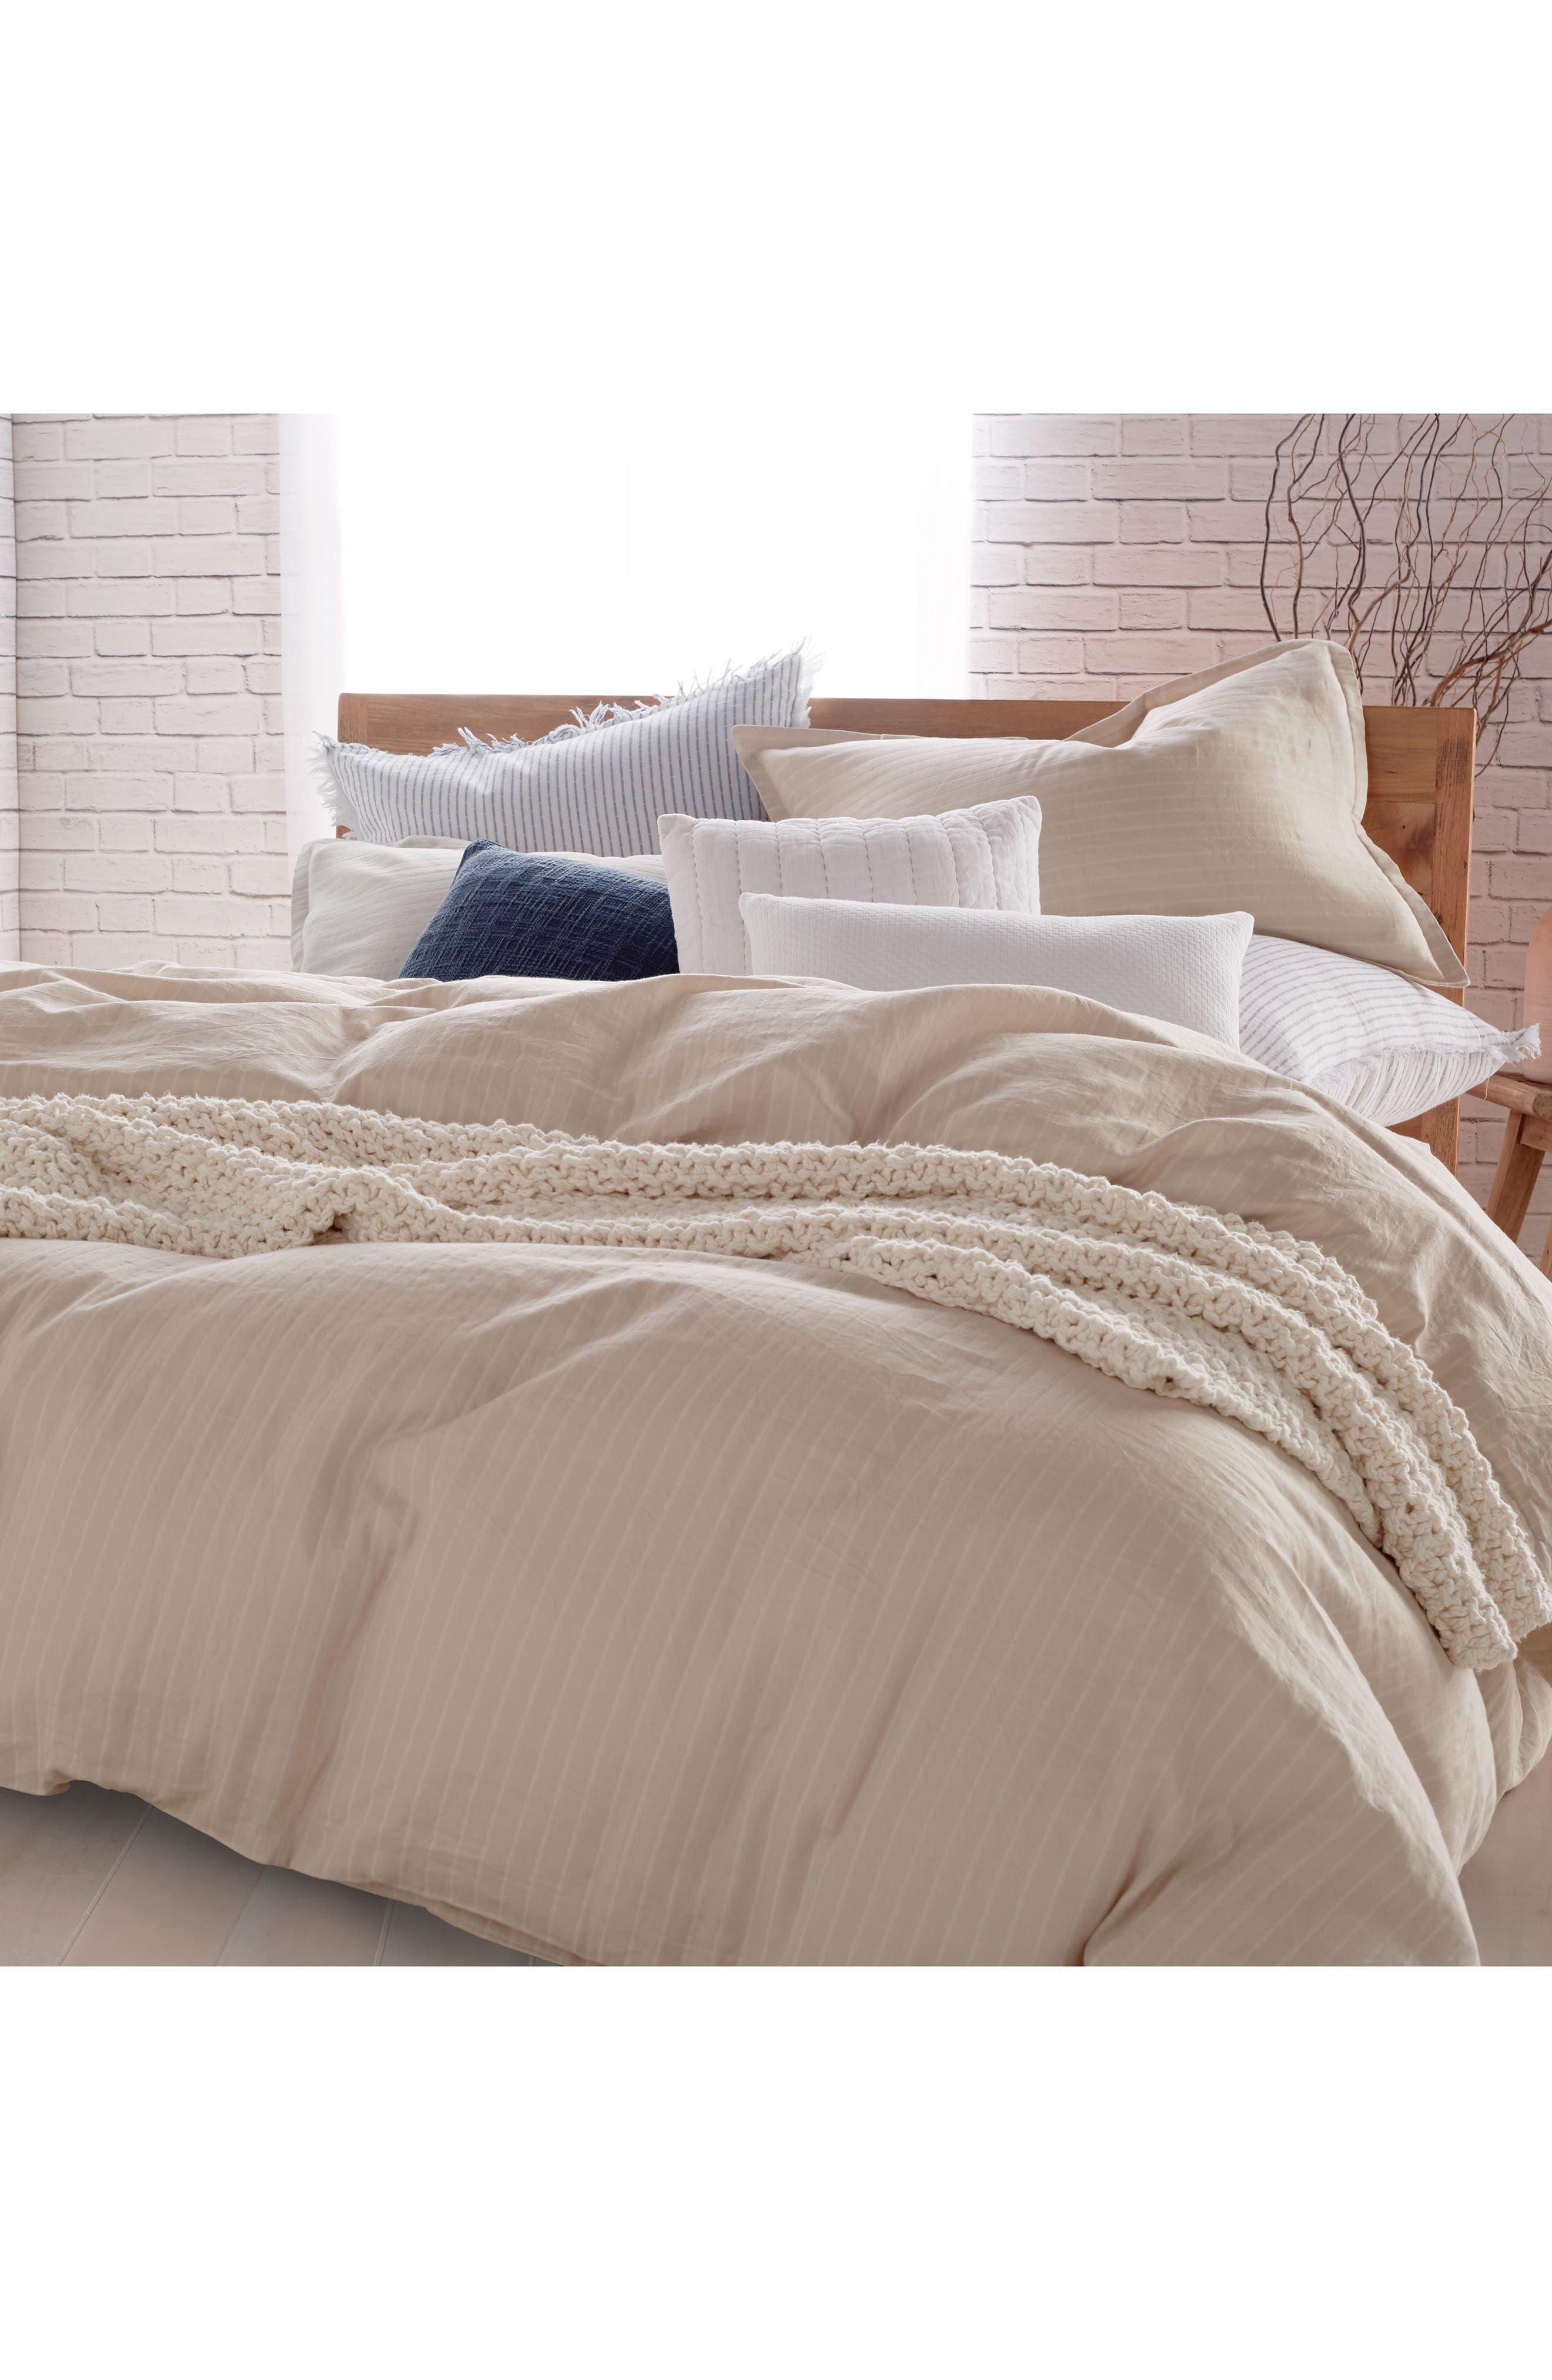 PURE Comfy Duvet Cover,                         Main,                         color, Linen